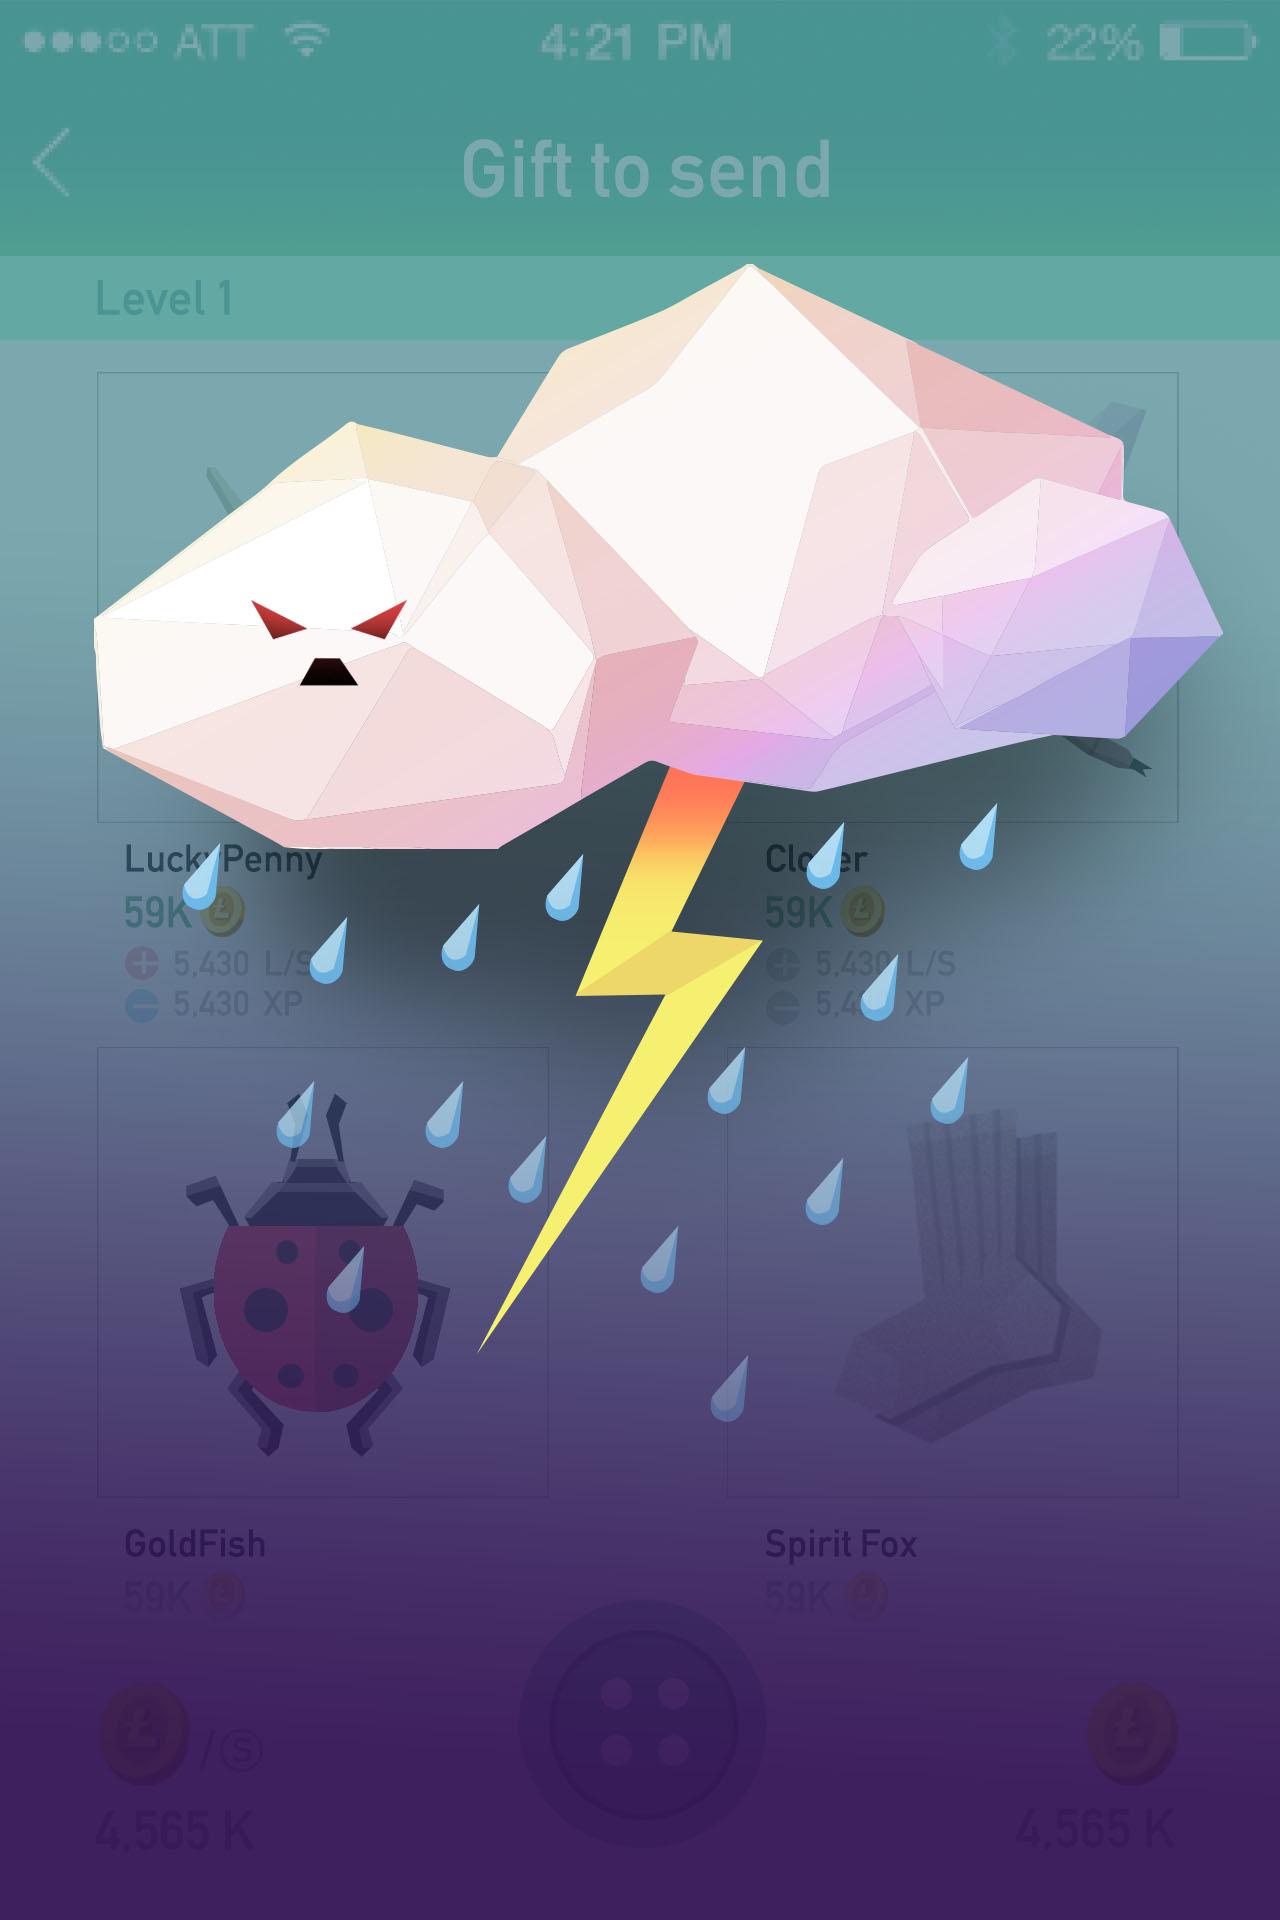 GiftToSend-JLL-NewAdditions1-StormCloud